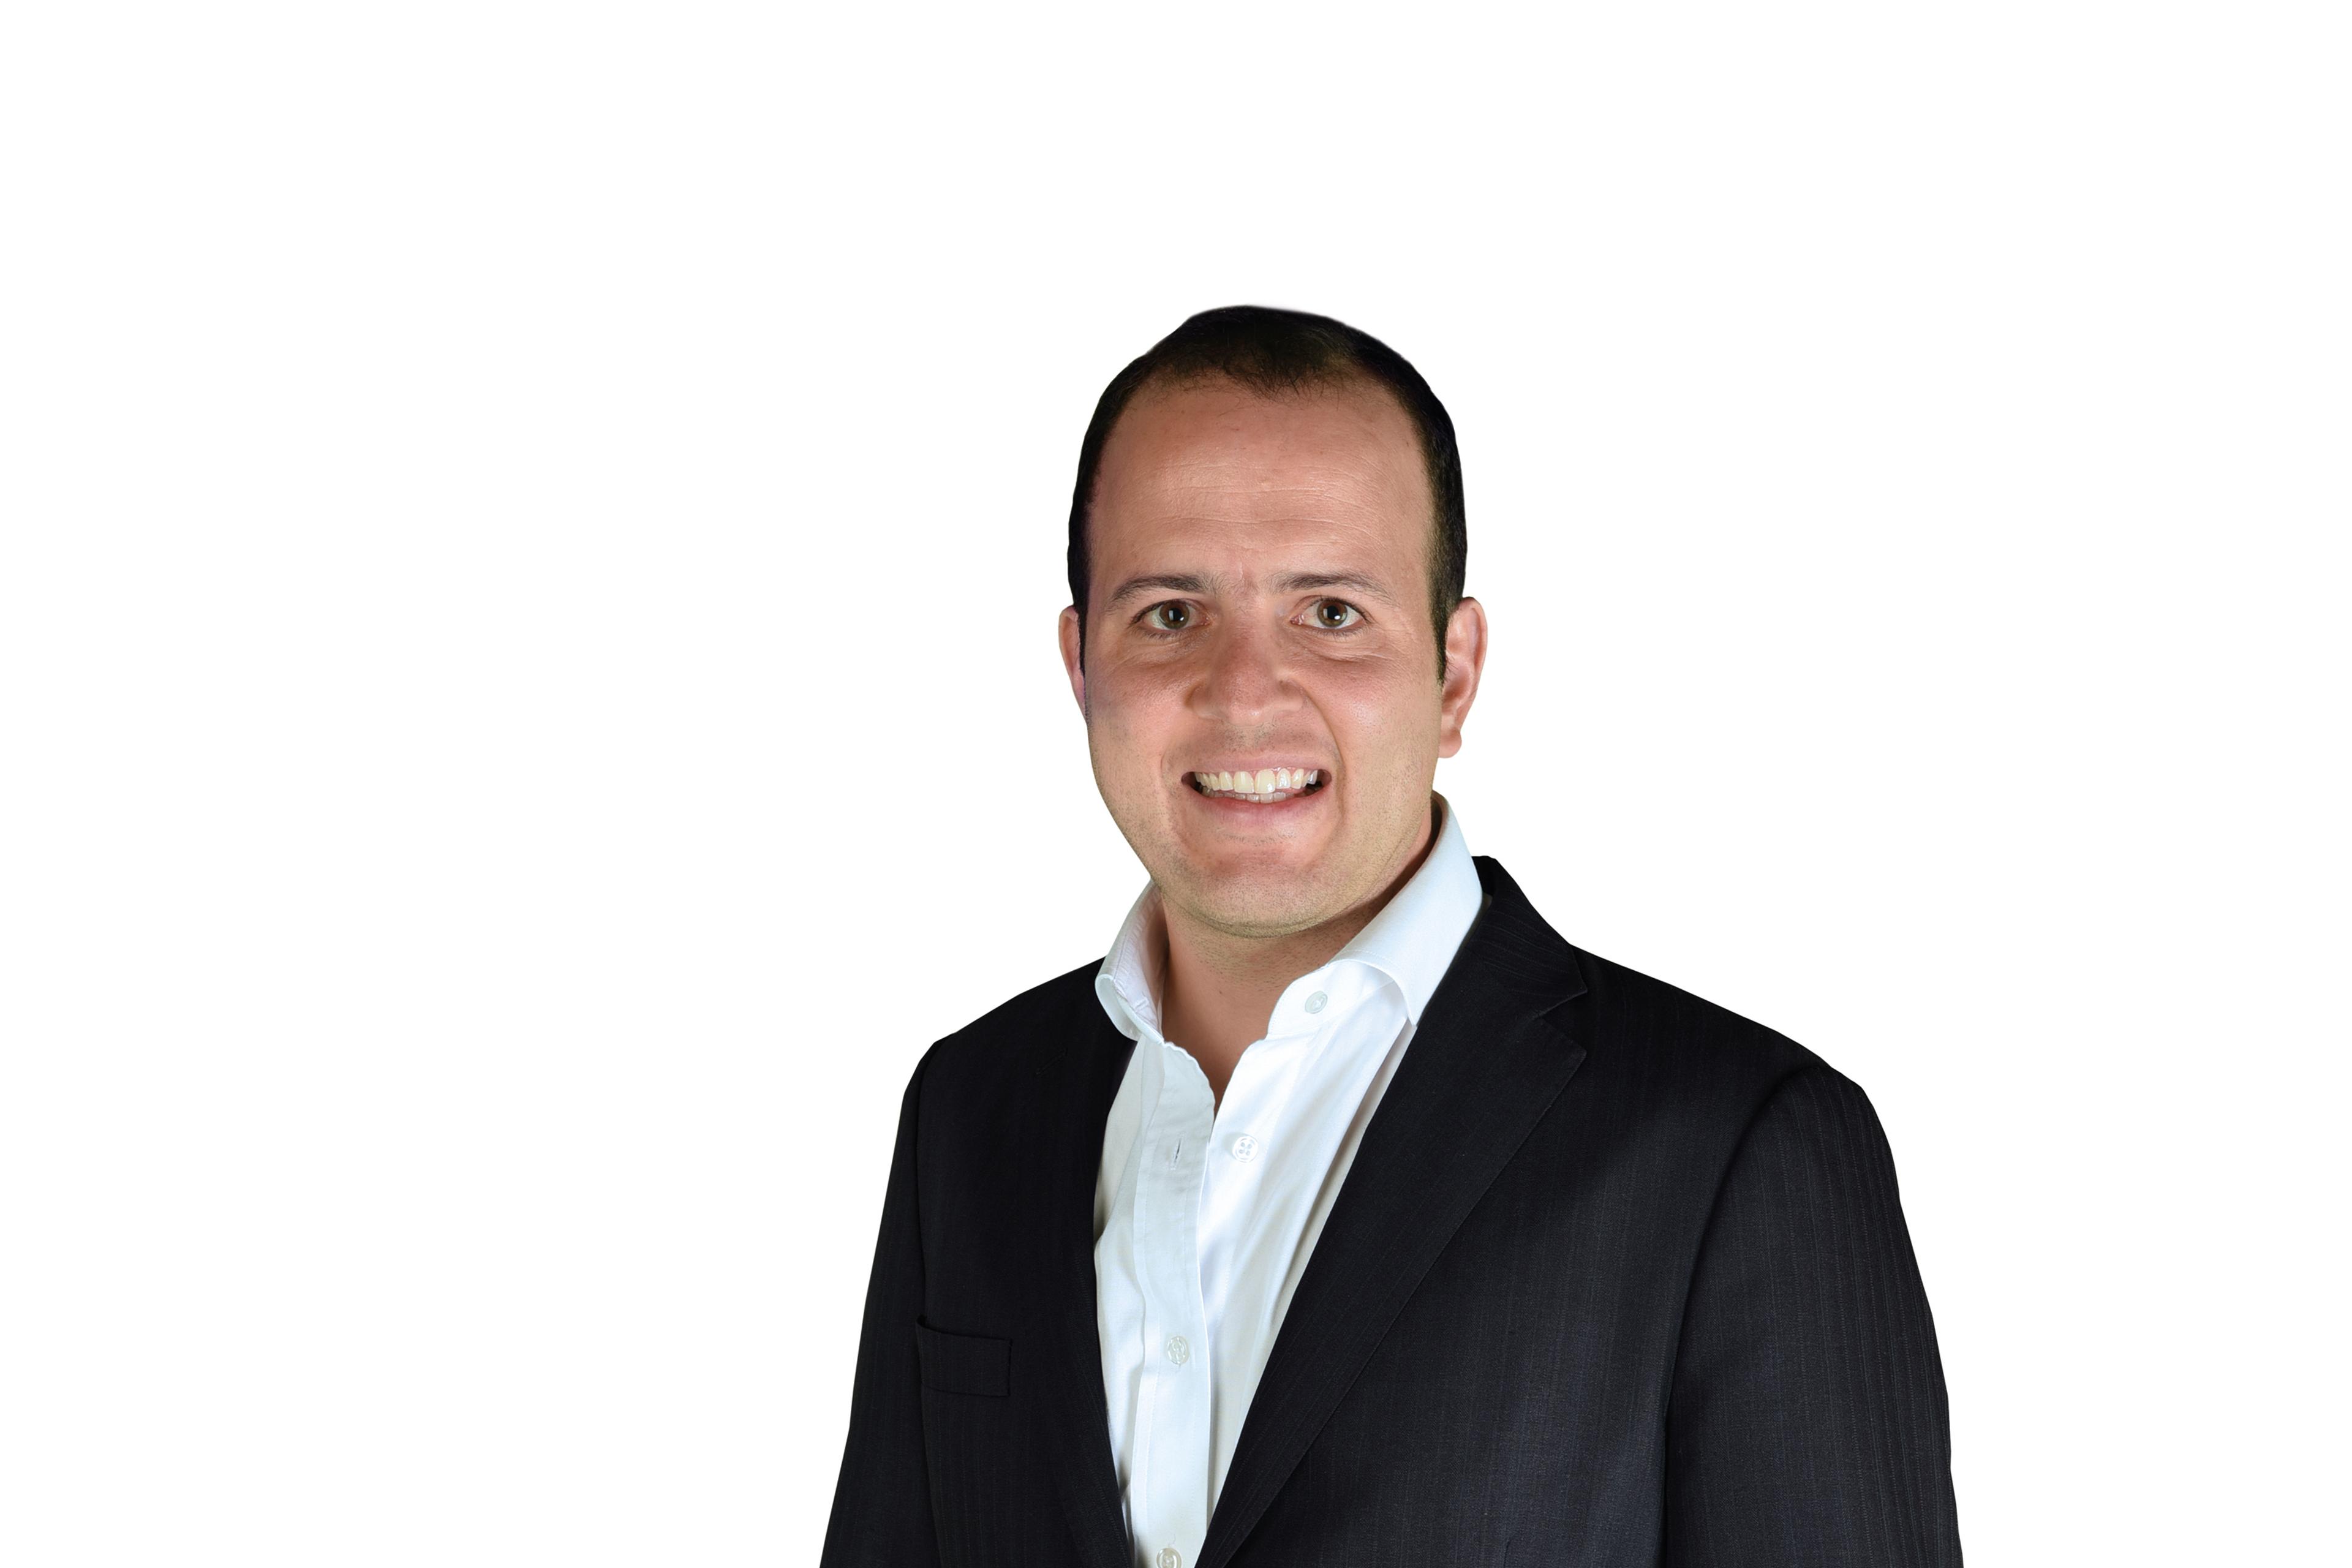 2019 Entrepreneur José Shabot Cherem